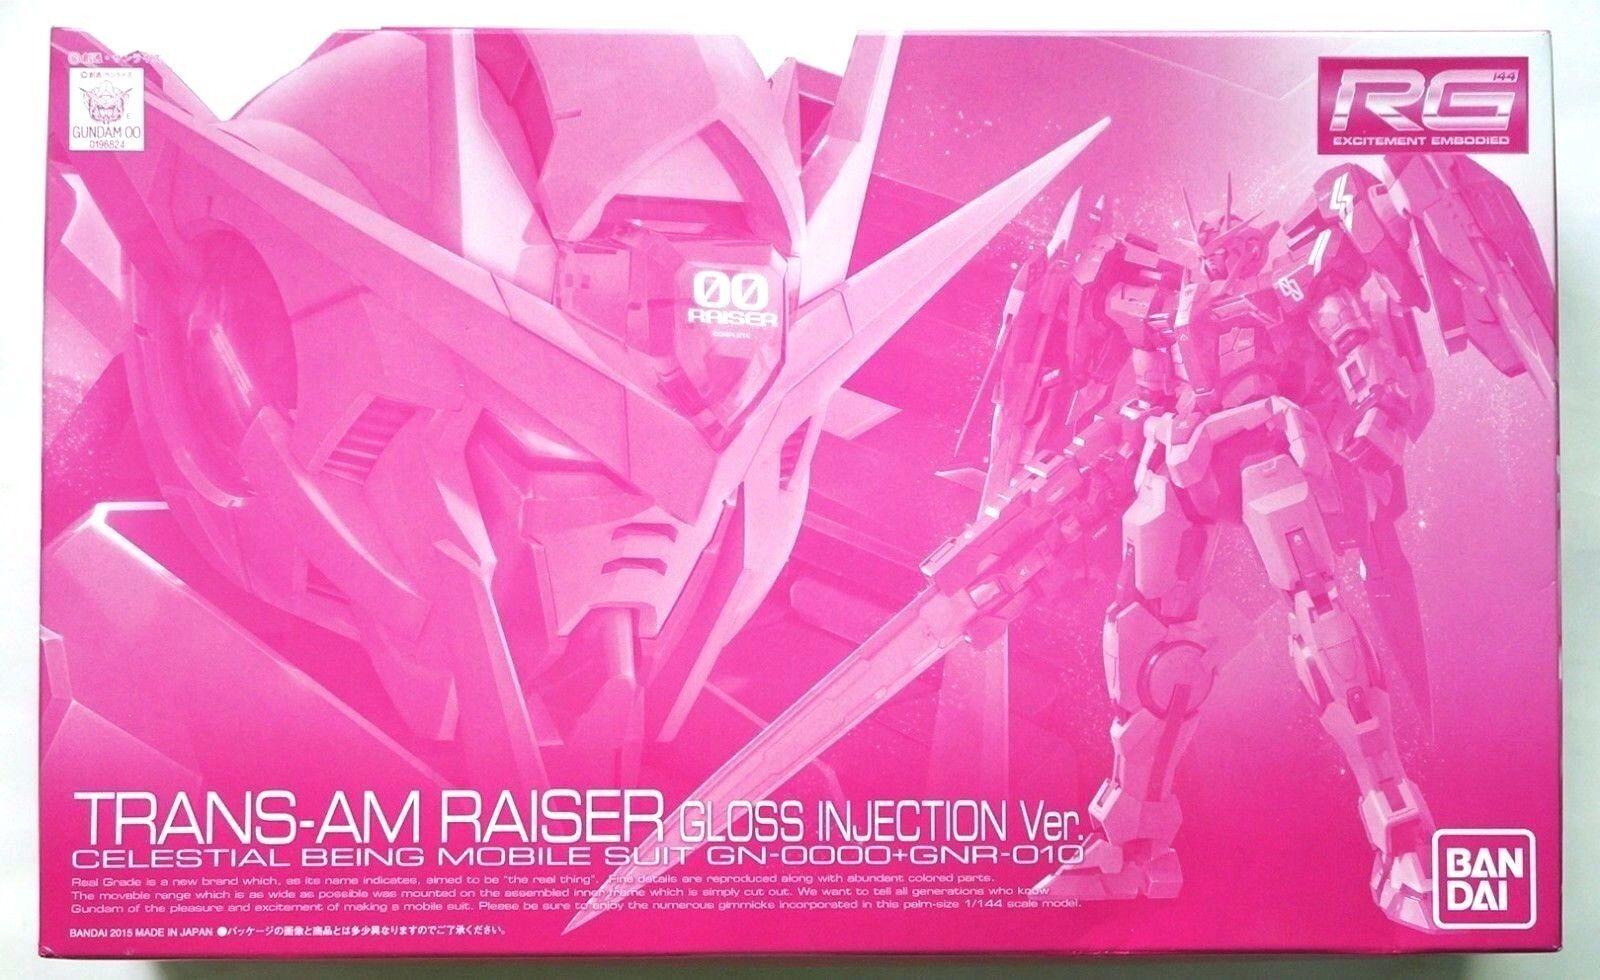 BANDAI RG 1 144 Trans-am Raiser Gloss Injection ver. limited scale model kit